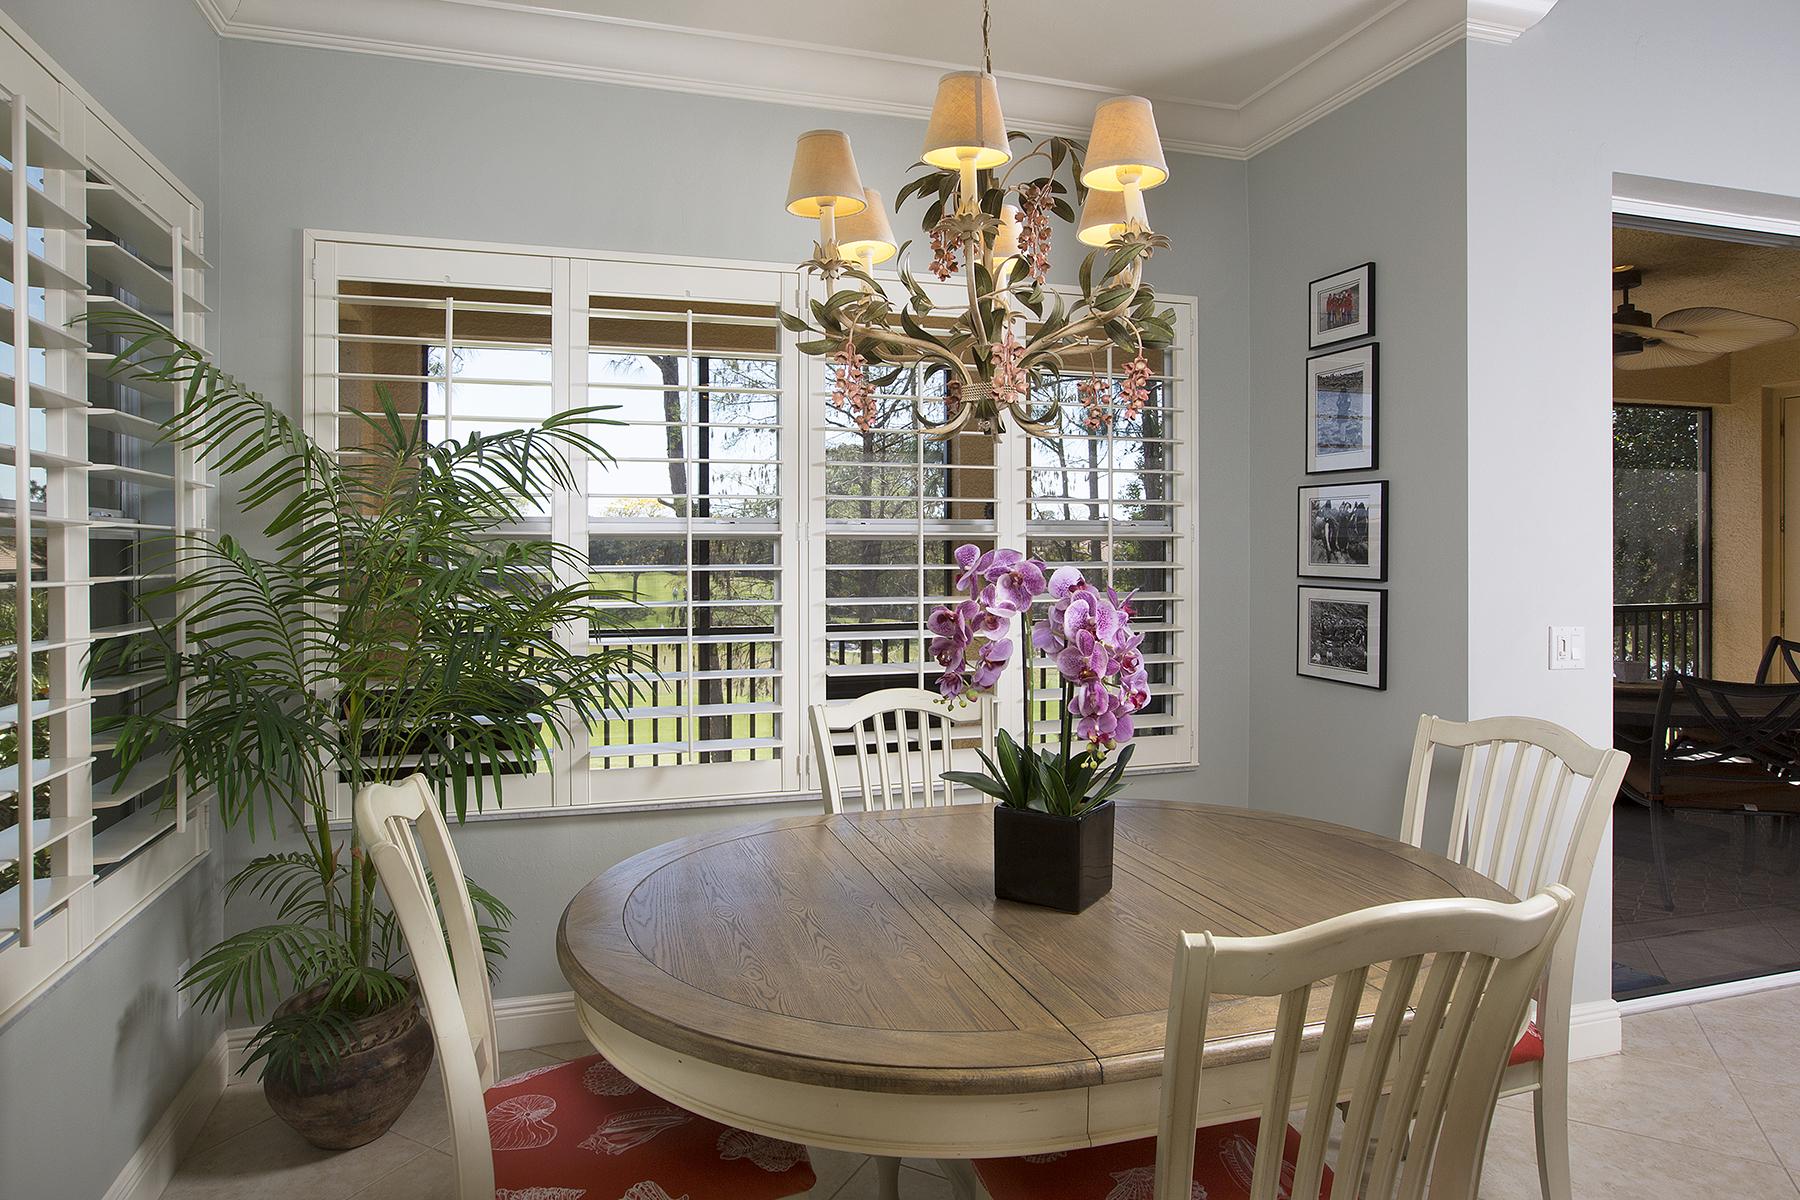 Additional photo for property listing at VASARI - ALTESSA 28510  Altessa Way 201,  Bonita Springs, Florida 34135 United States